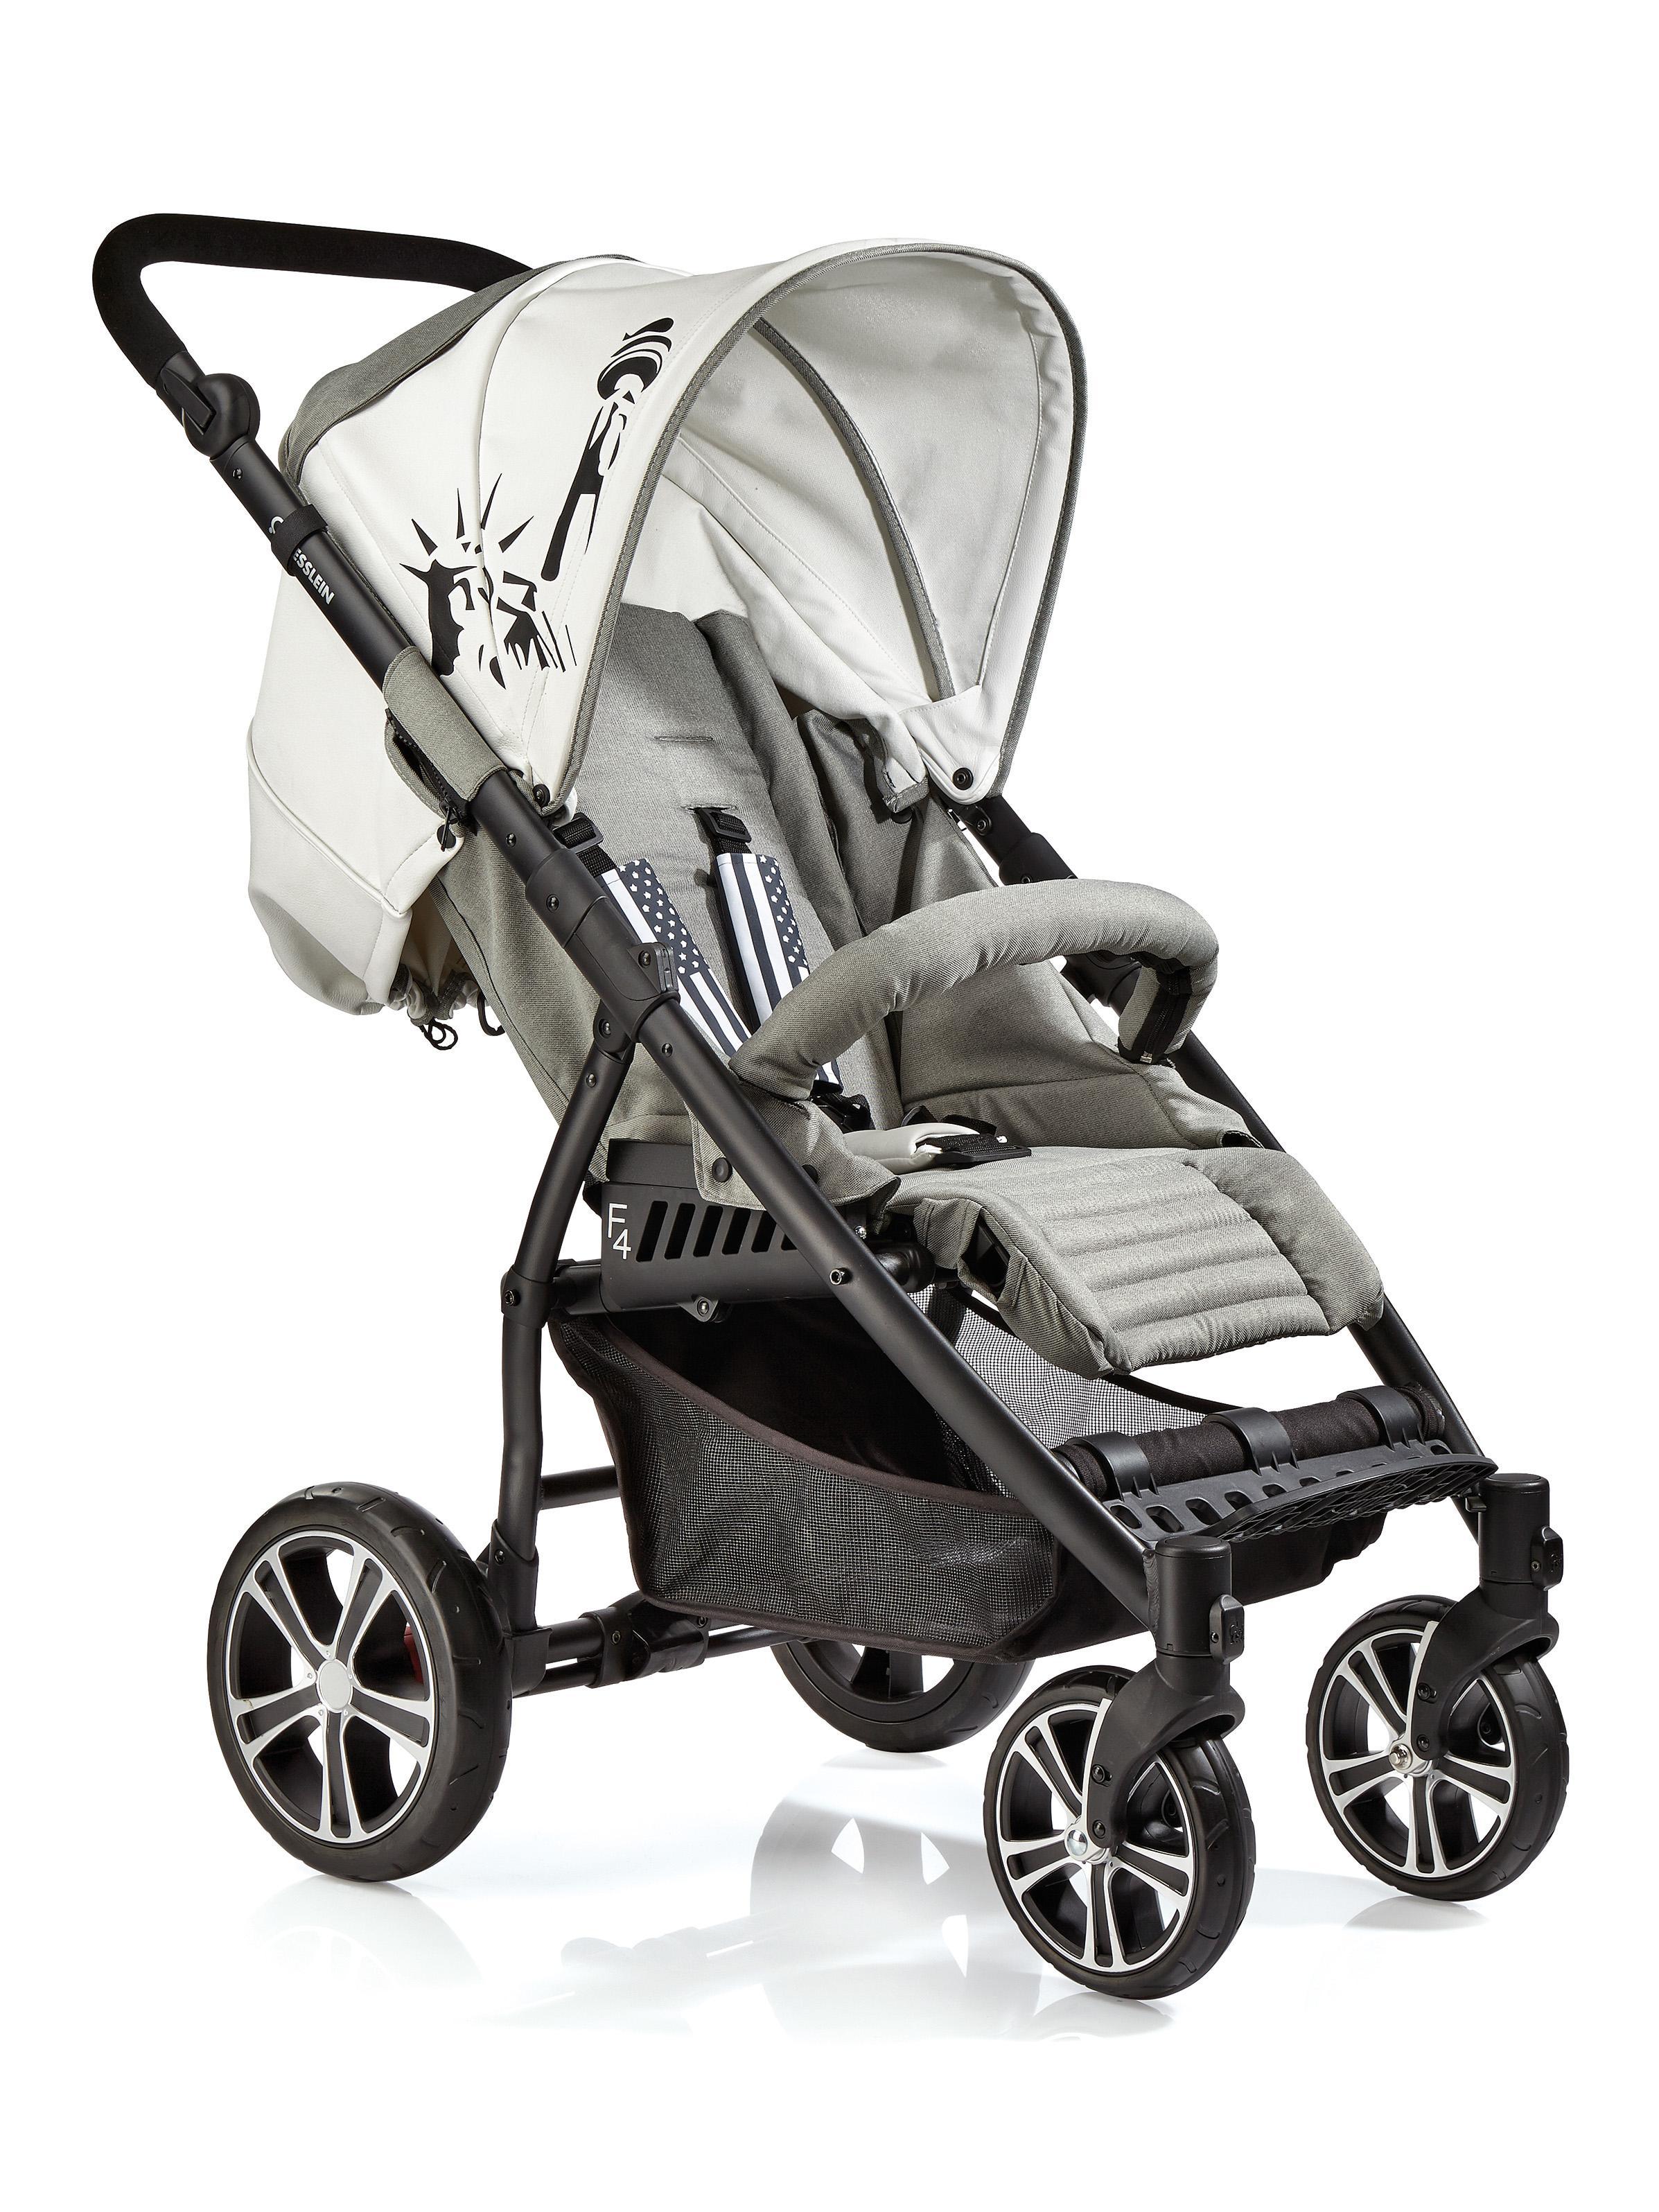 gesslein 304000575000 buggy s4 braun baby. Black Bedroom Furniture Sets. Home Design Ideas